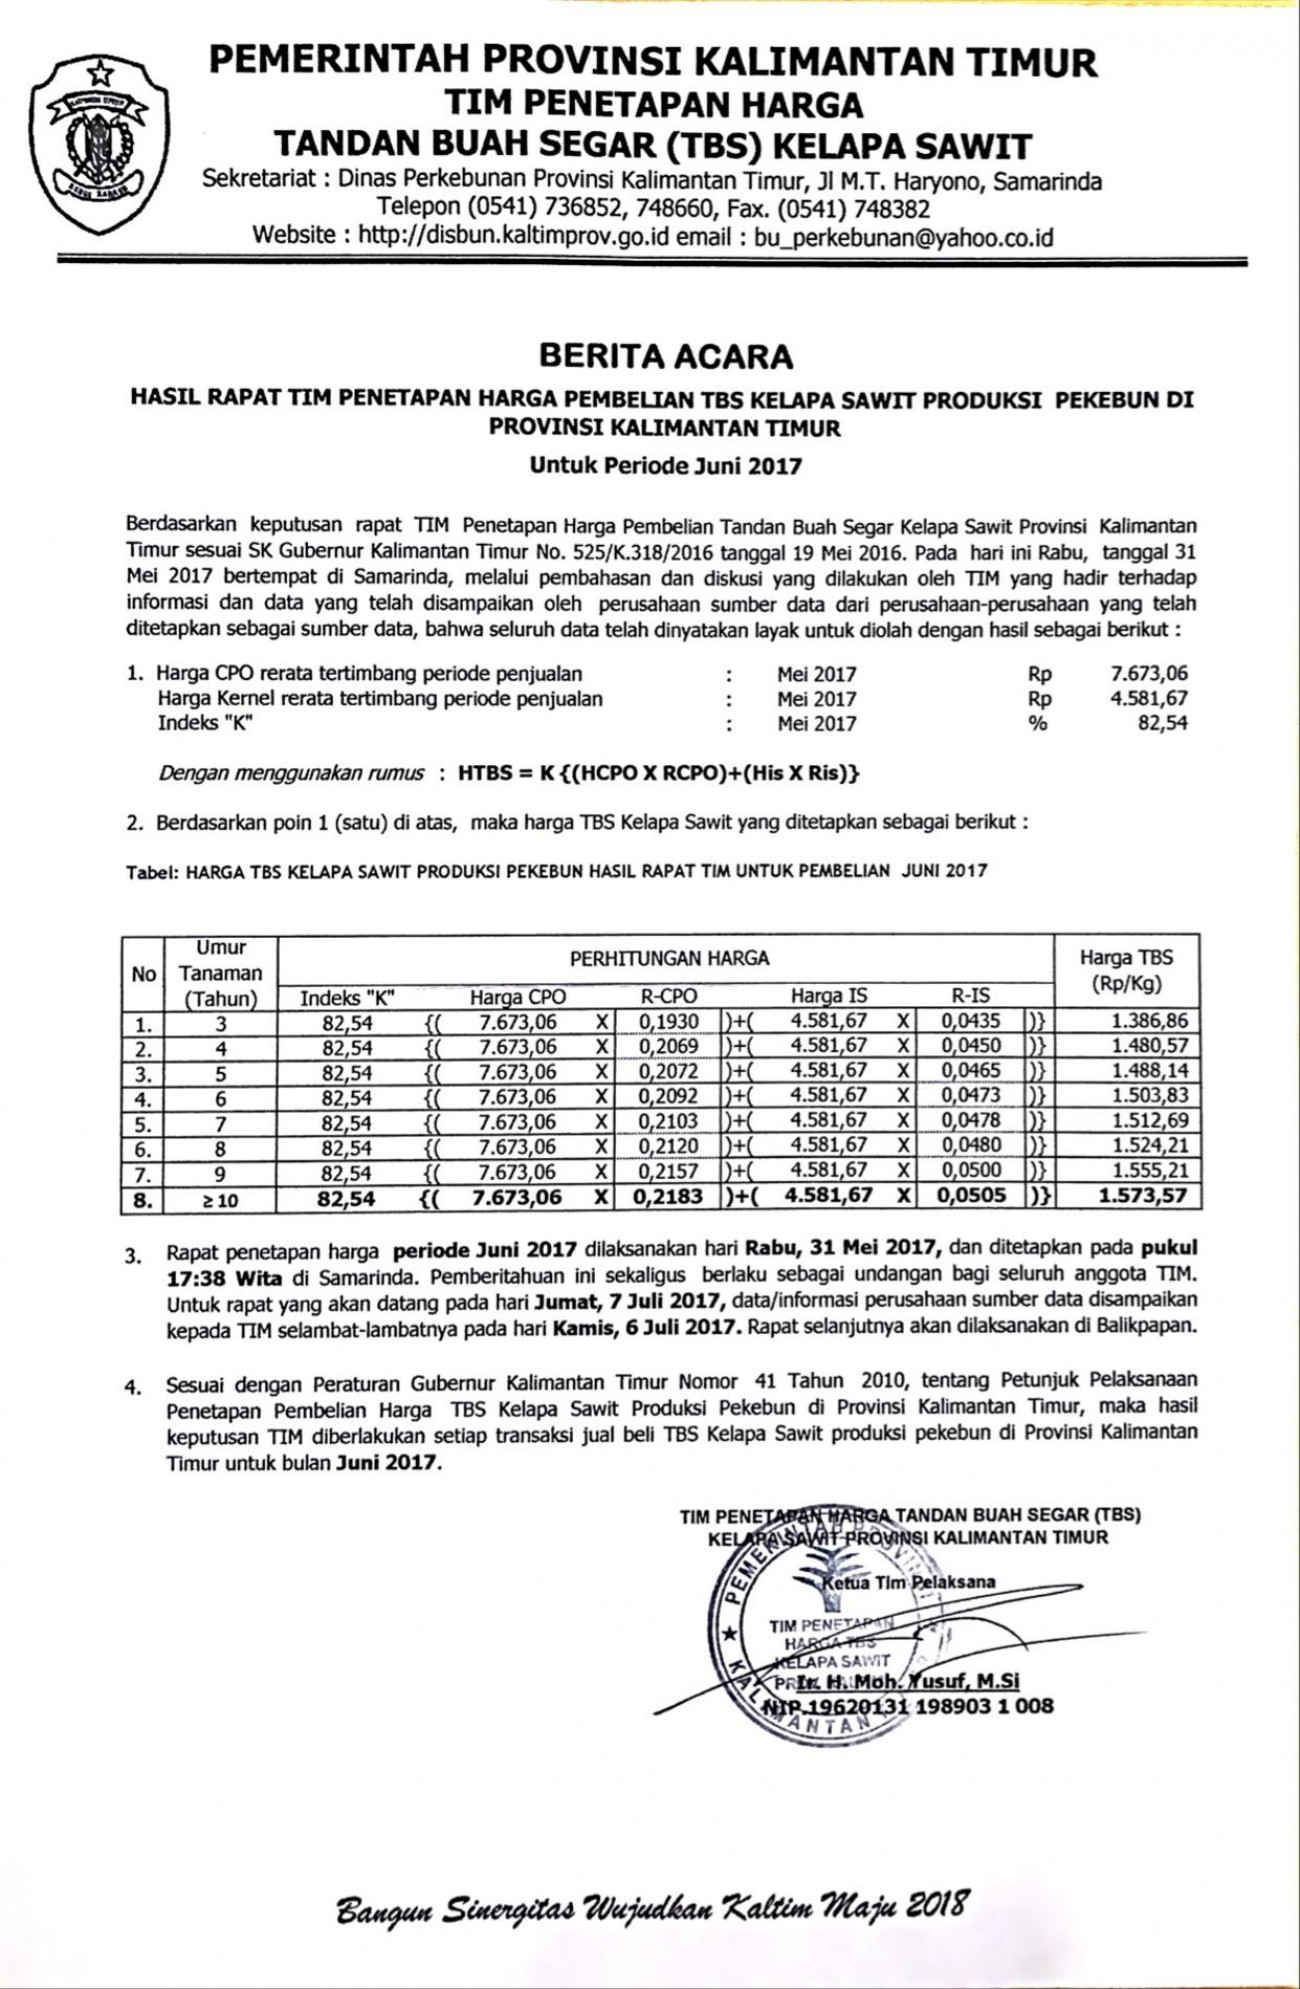 Informasi Harga TBS Kelapa Sawit Bulan Juni 2017